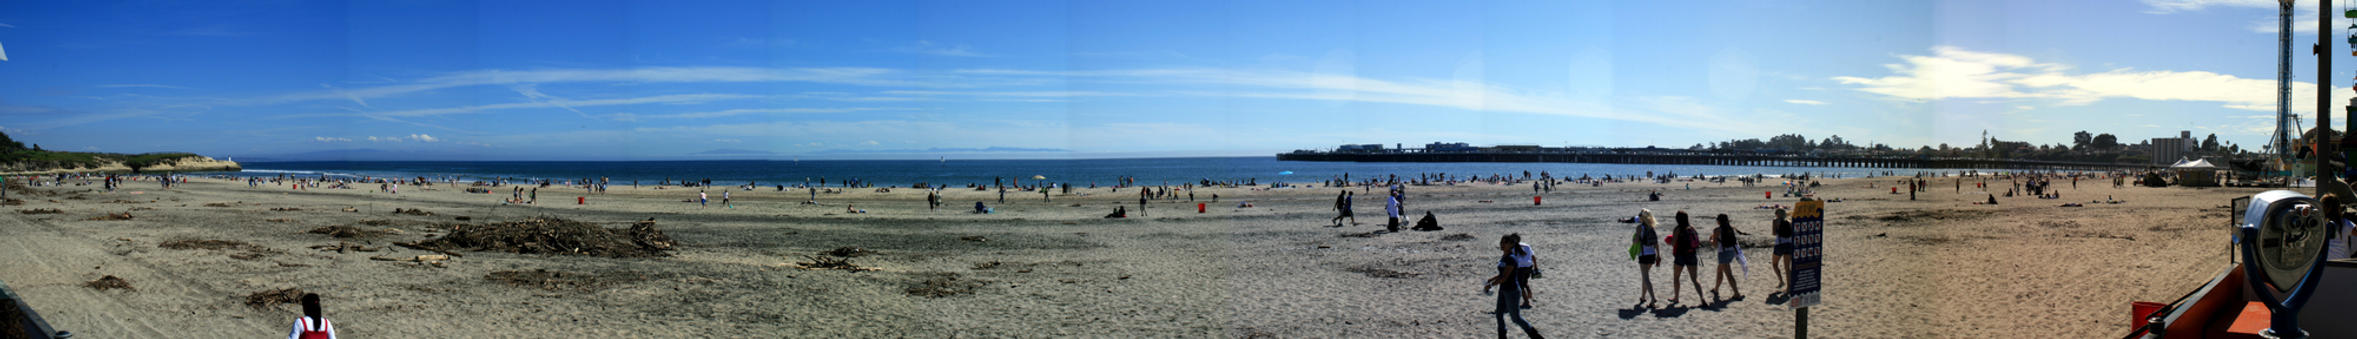 Santa Cruz Beach by dhunley